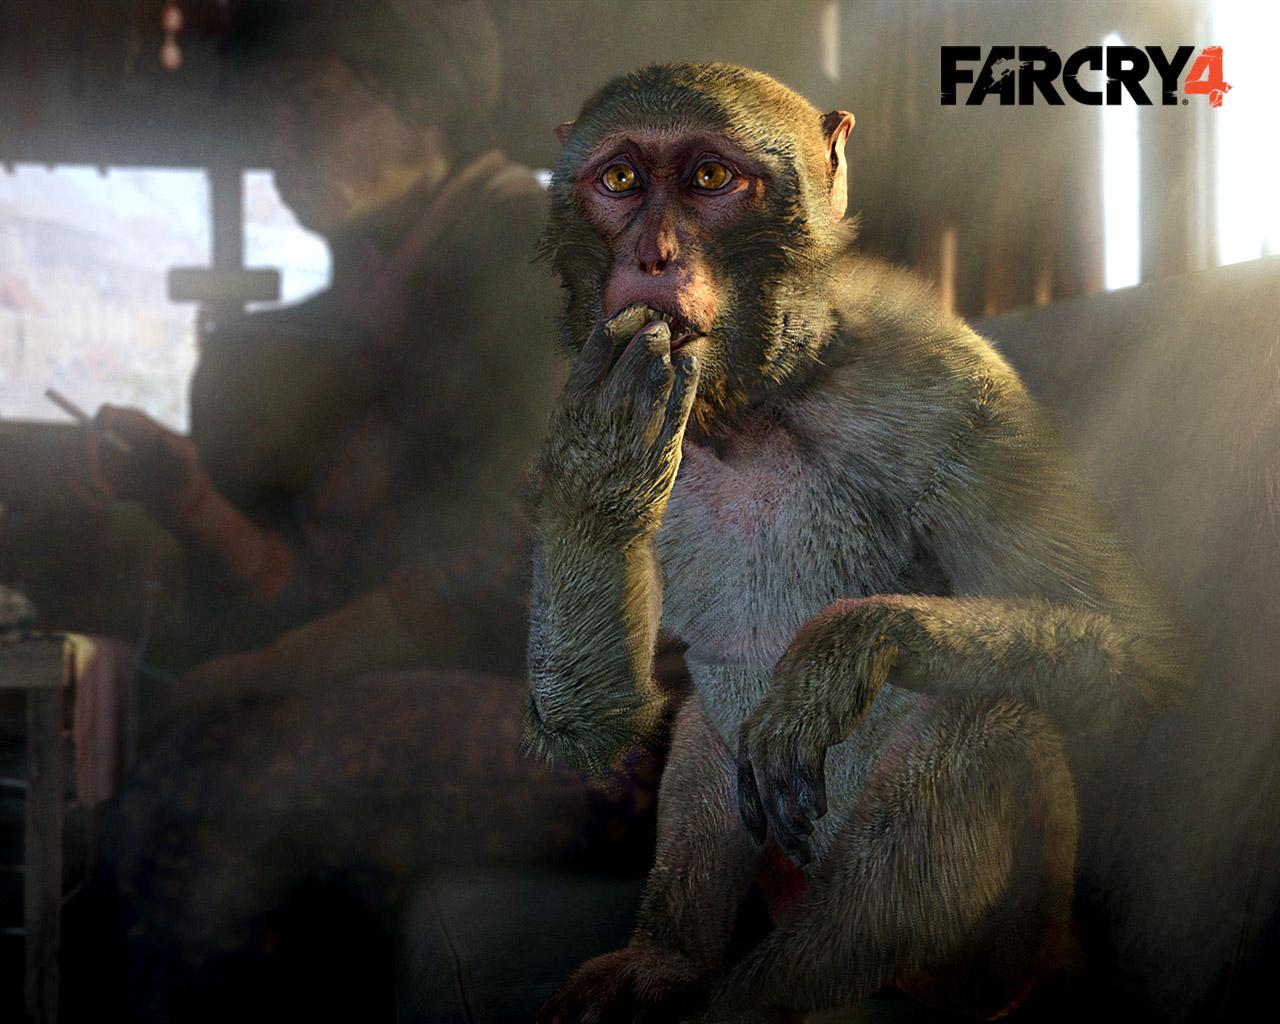 Far Cry 4 Wallpaper in 1280x1024